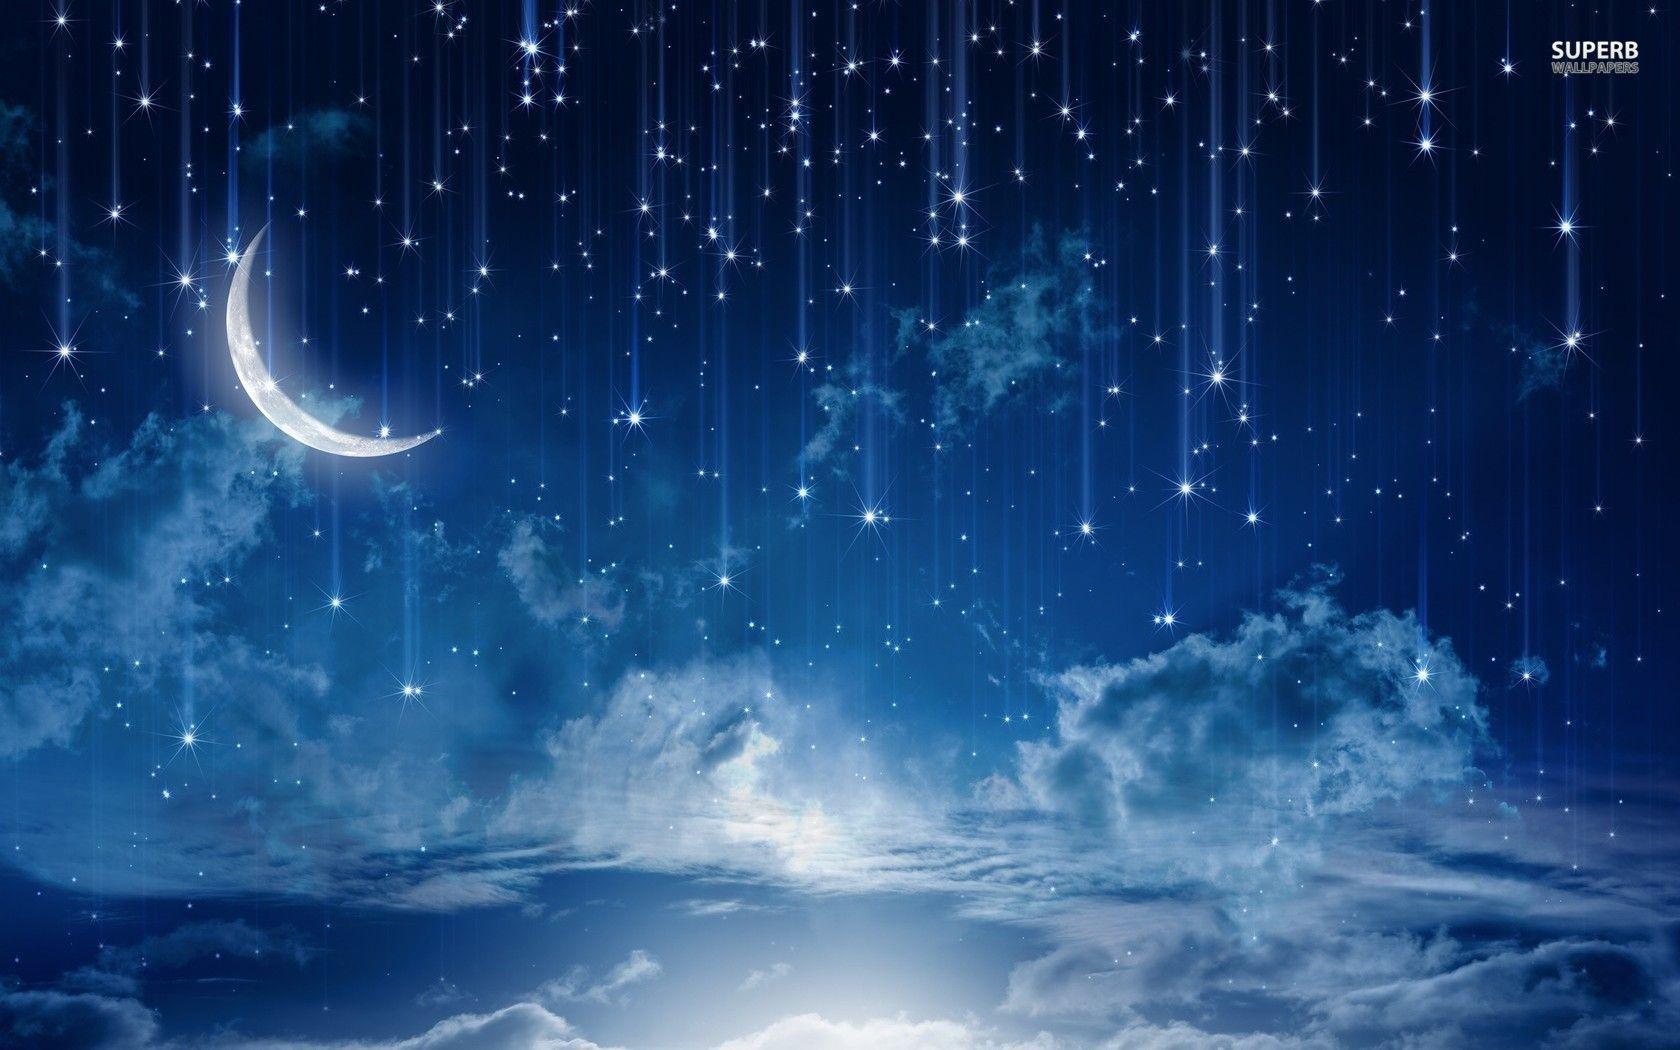 Shooting Star Wallpapers Stars Hd Space 1600x1200px Wallpaper Night Sky Wallpaper Star Wallpaper Night Sky Stars